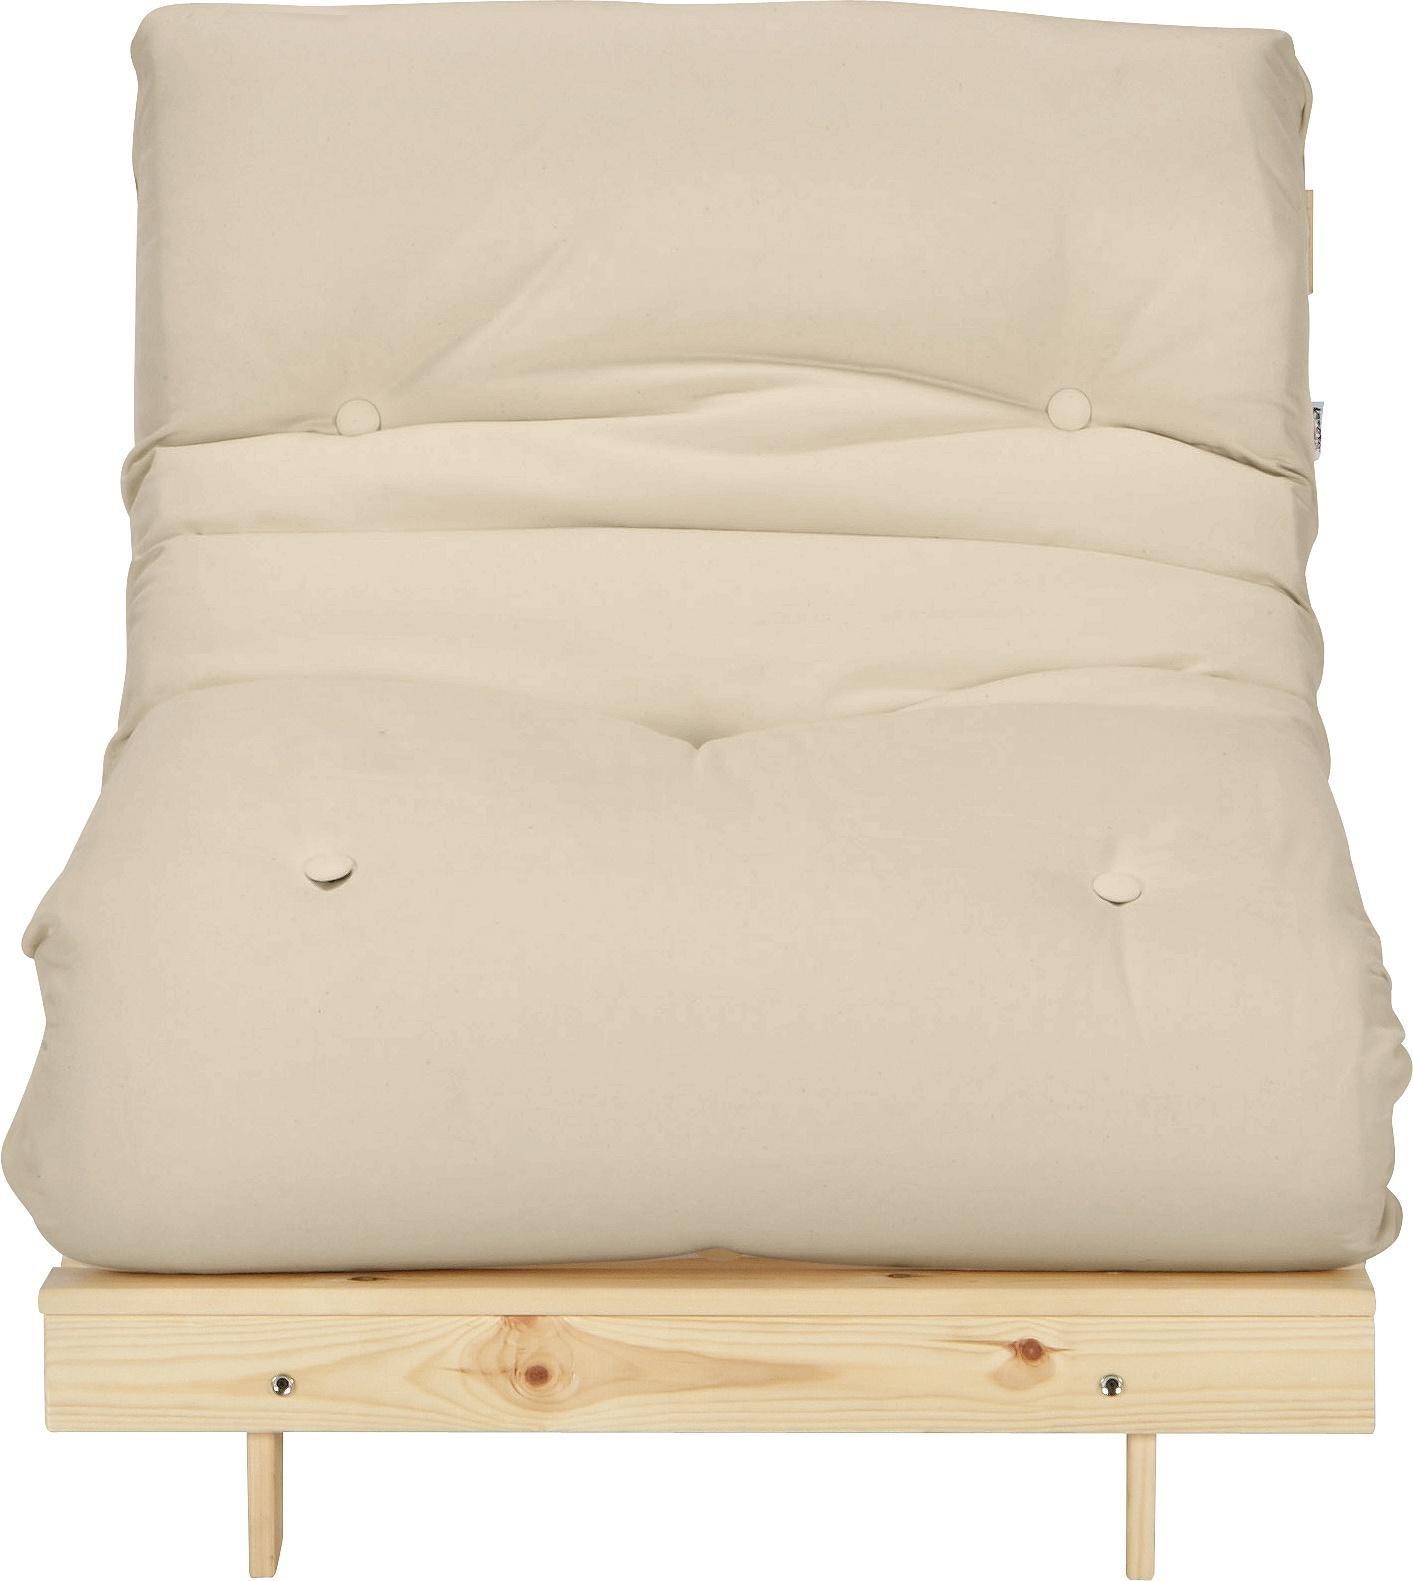 Buy ColourMatch Single Futon Sofa Bed w Mattress Cotton